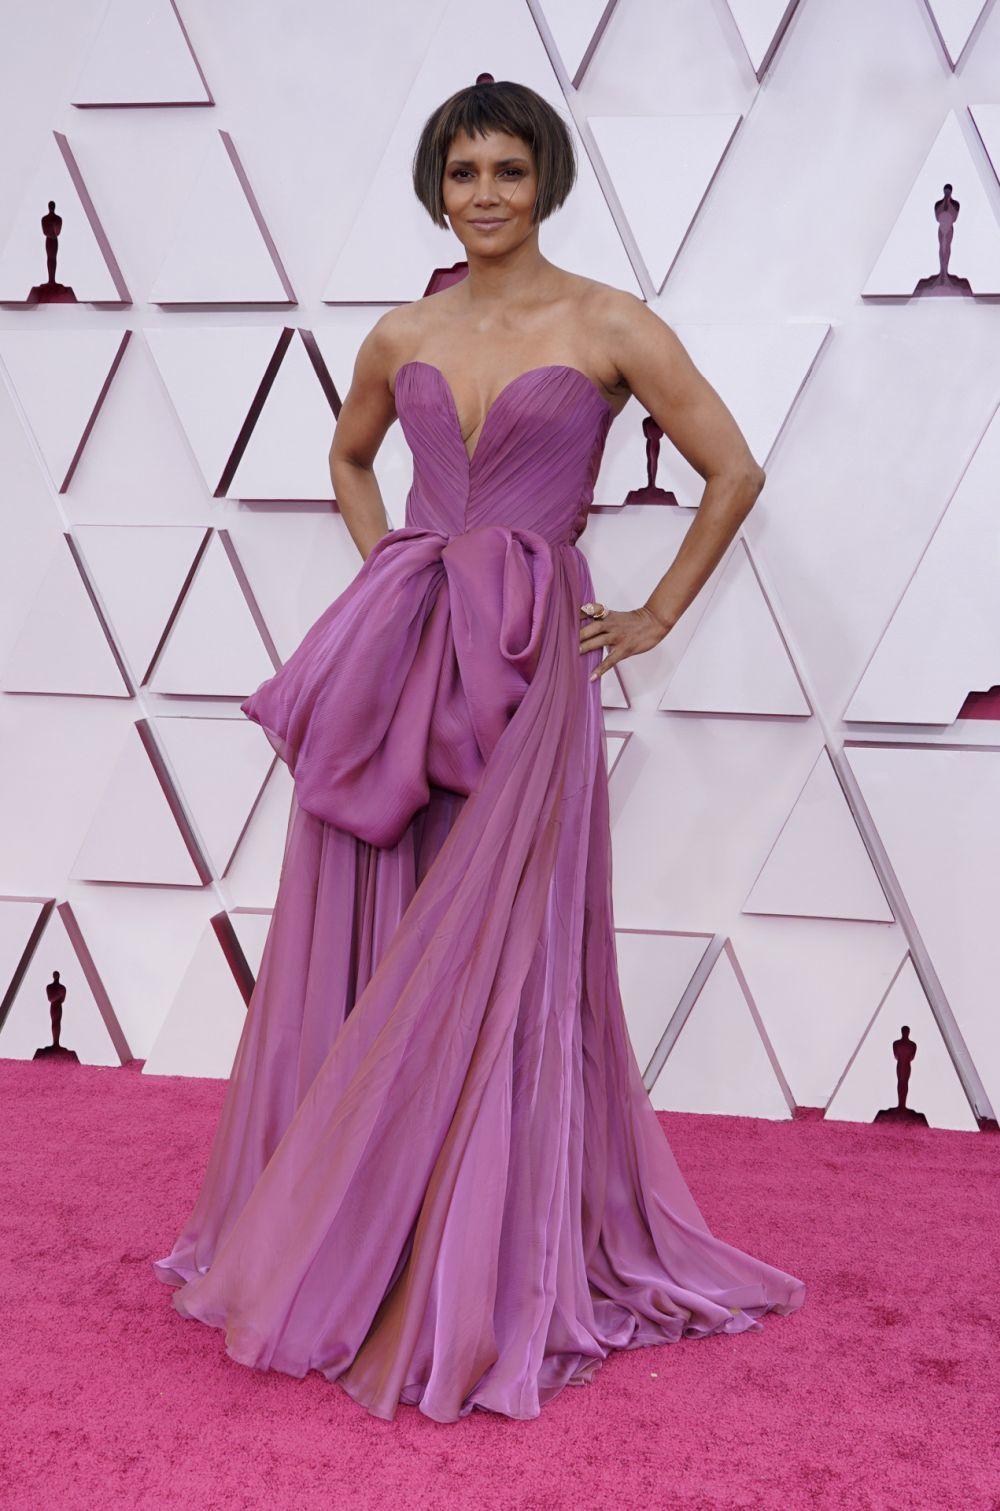 Con vestido de Dolce & Gabbana en tono lila empolvado, Halle Berry estaba espectacular en los Oscars 2021.